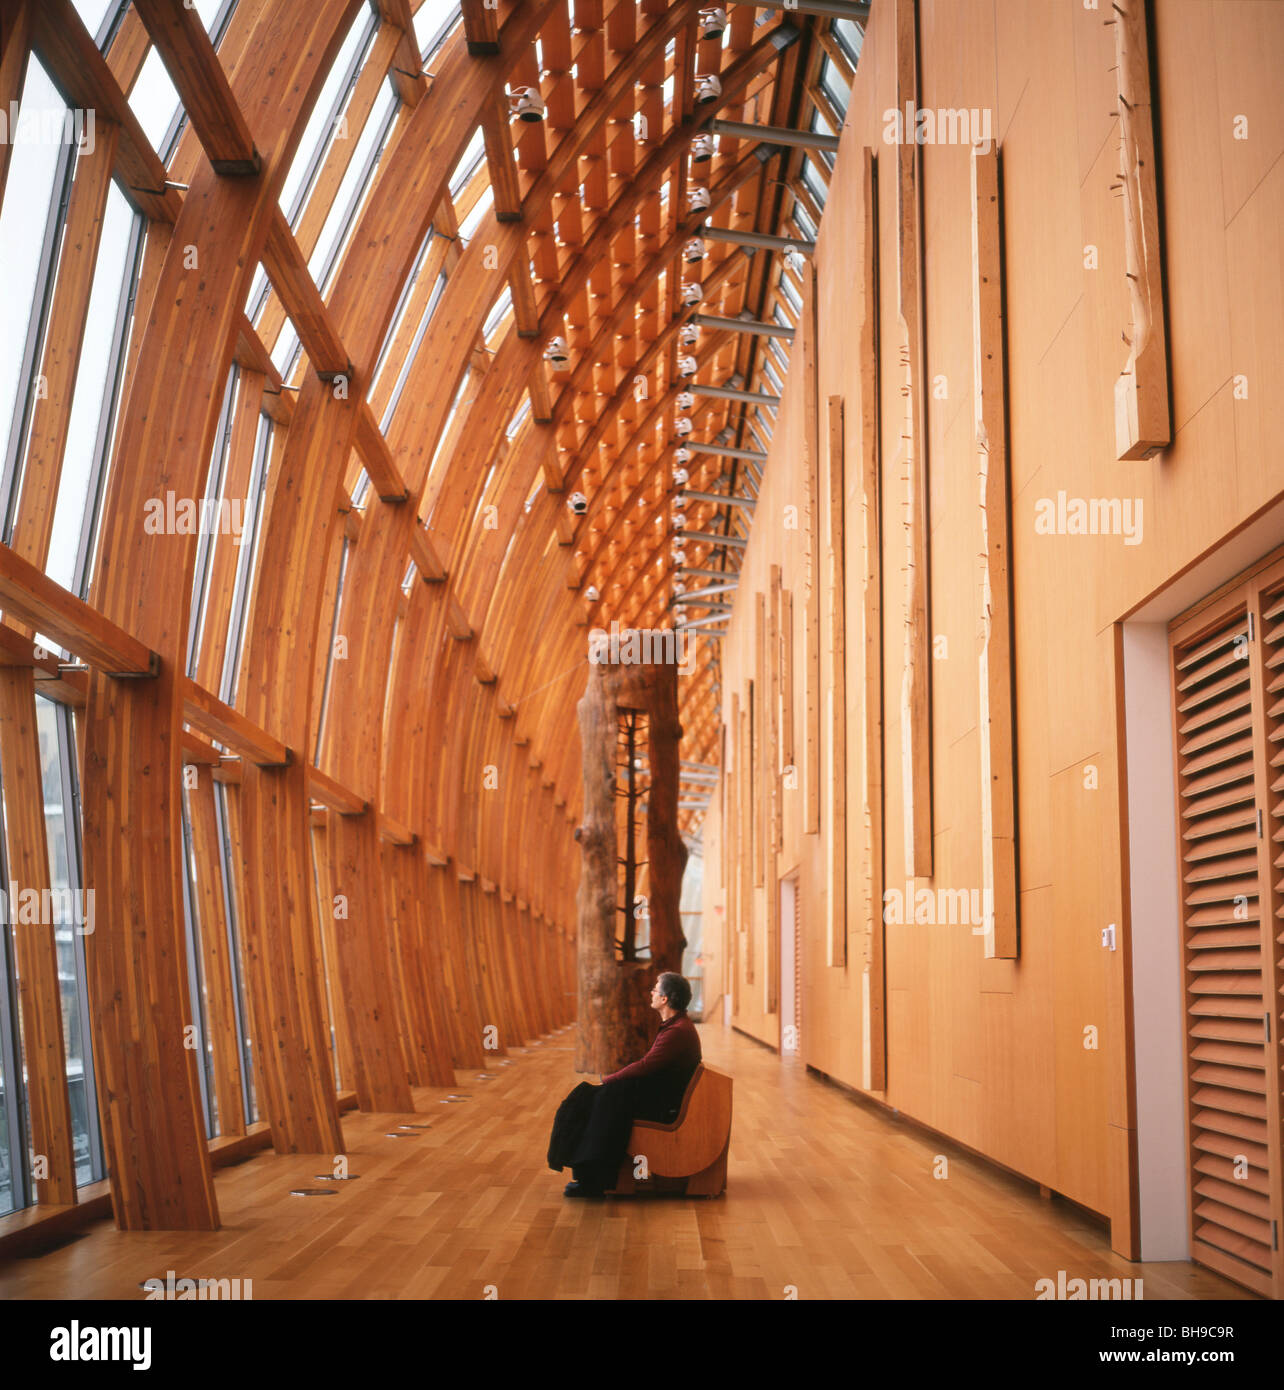 The new Galleria Italia at the Art Gallery of Ontario